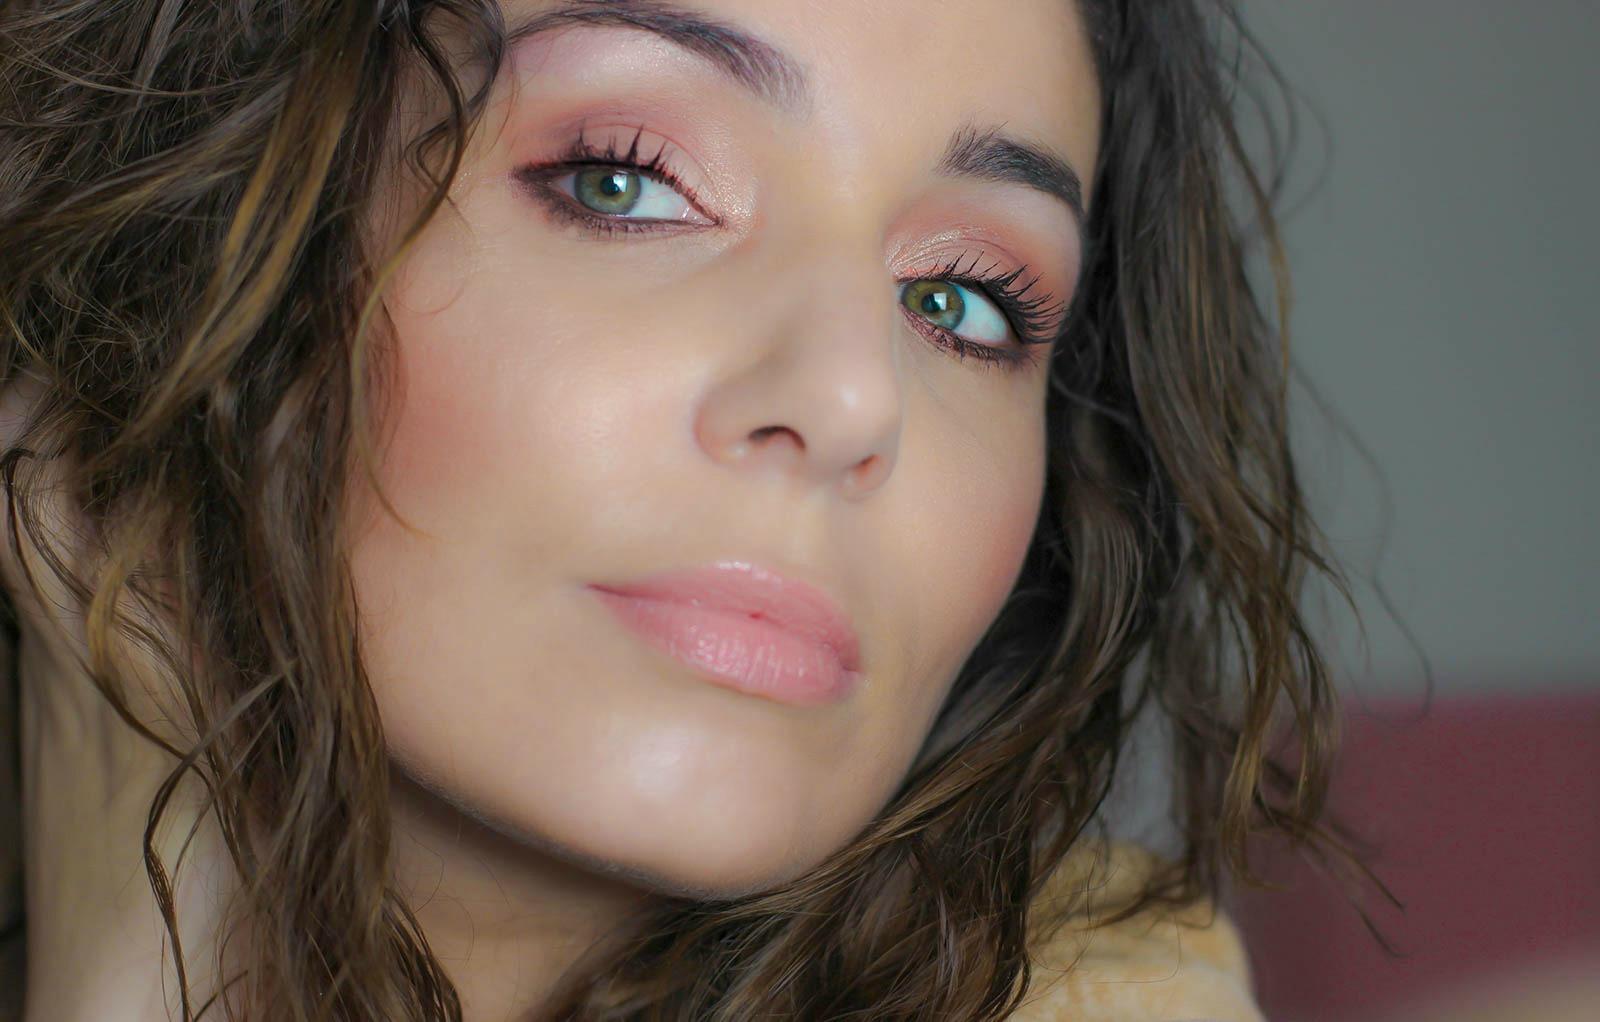 SWEET_PEACH_TOOFACED_makeup-4-2